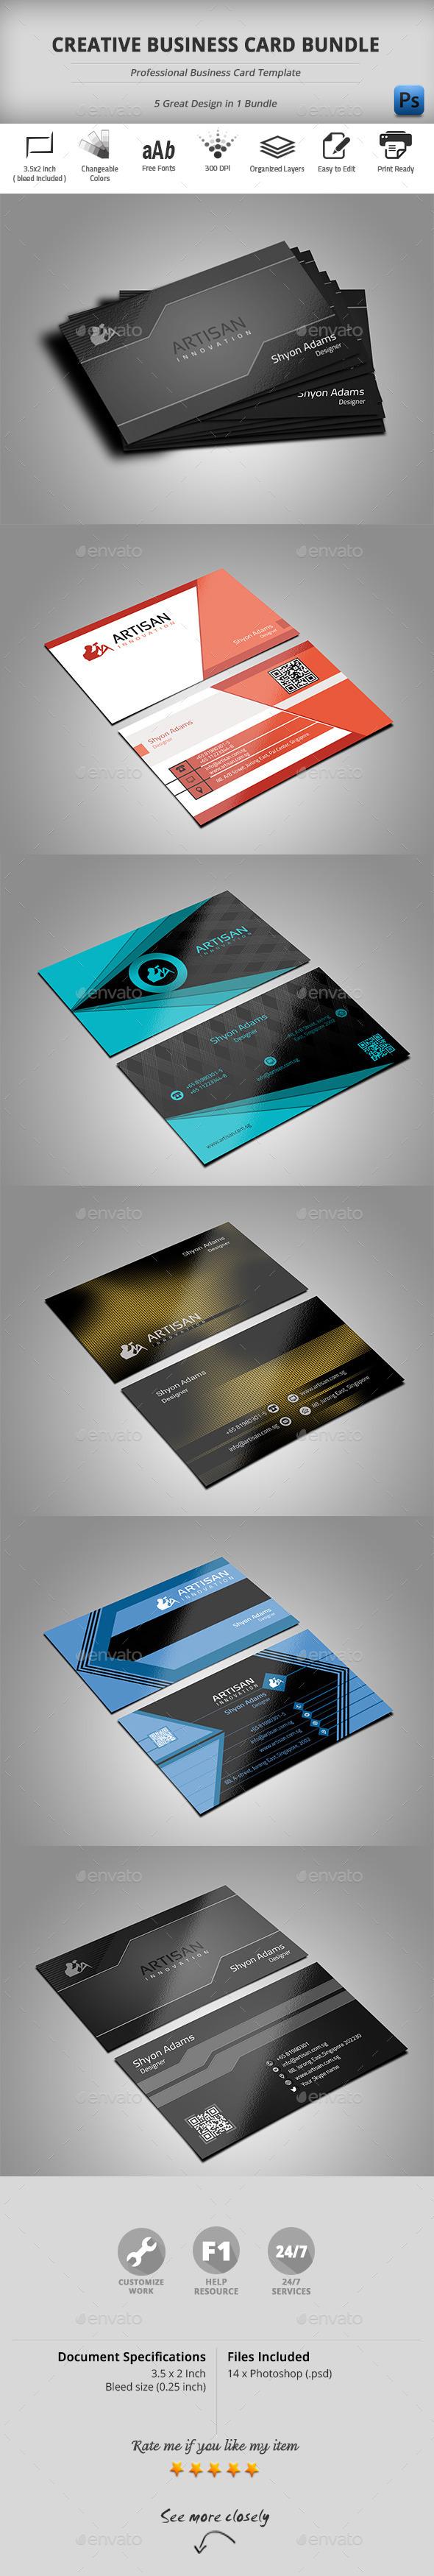 GraphicRiver Creative Business Card Bundle 10688424